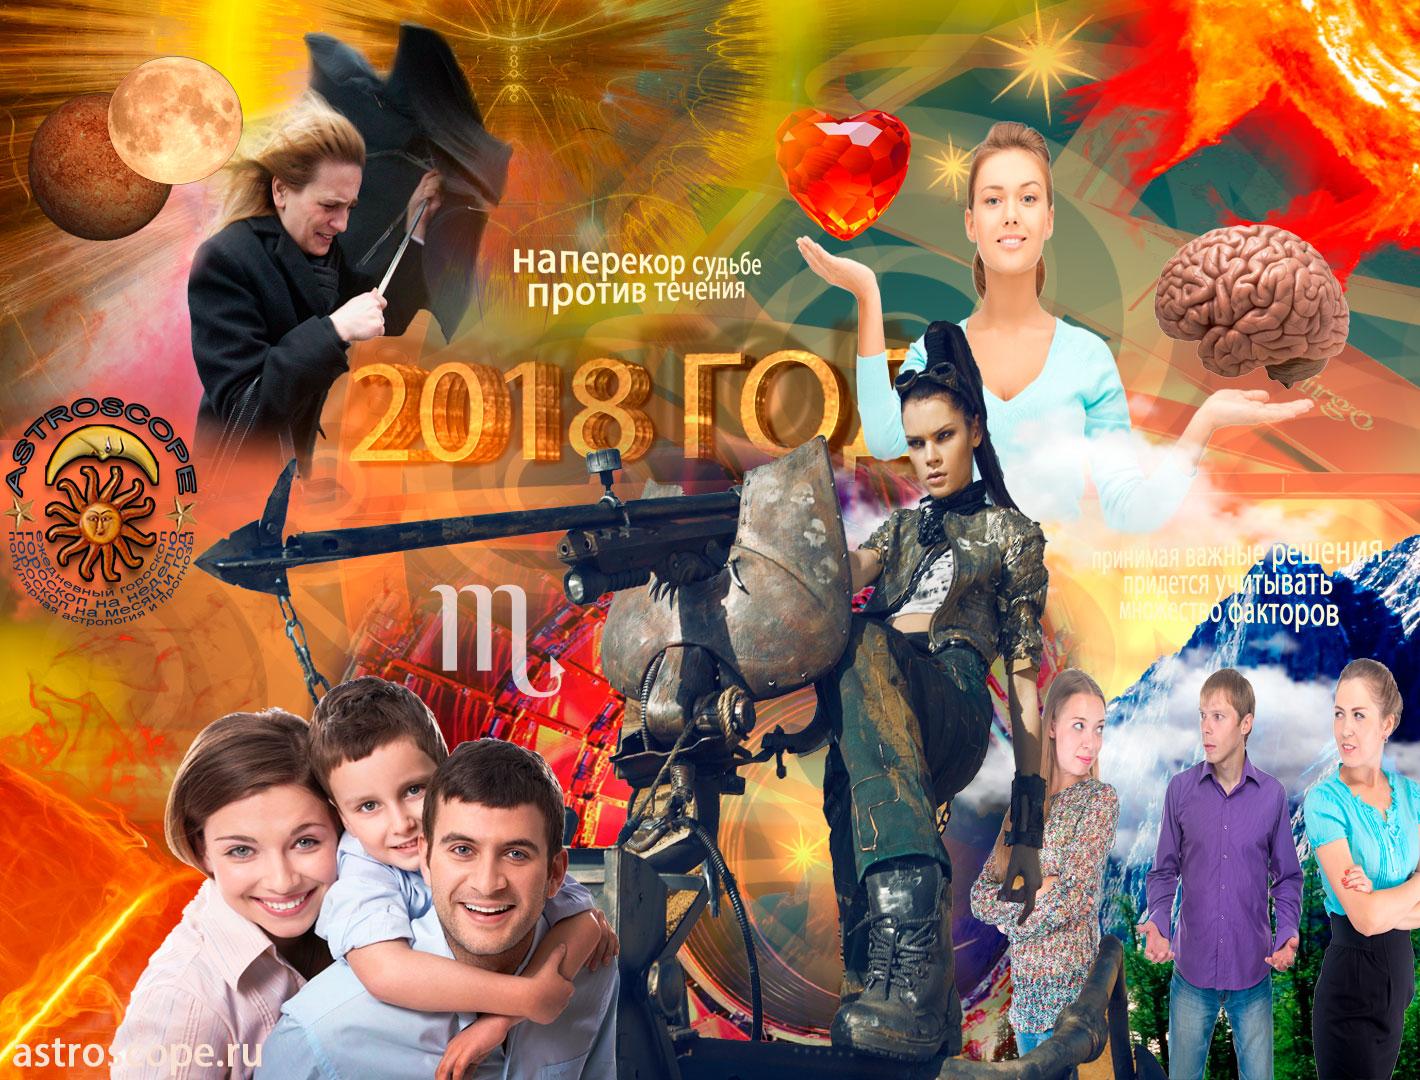 Гороскоп на 2018 год Скорпион, астрологический прогноз на 2018 год для Скорпионов